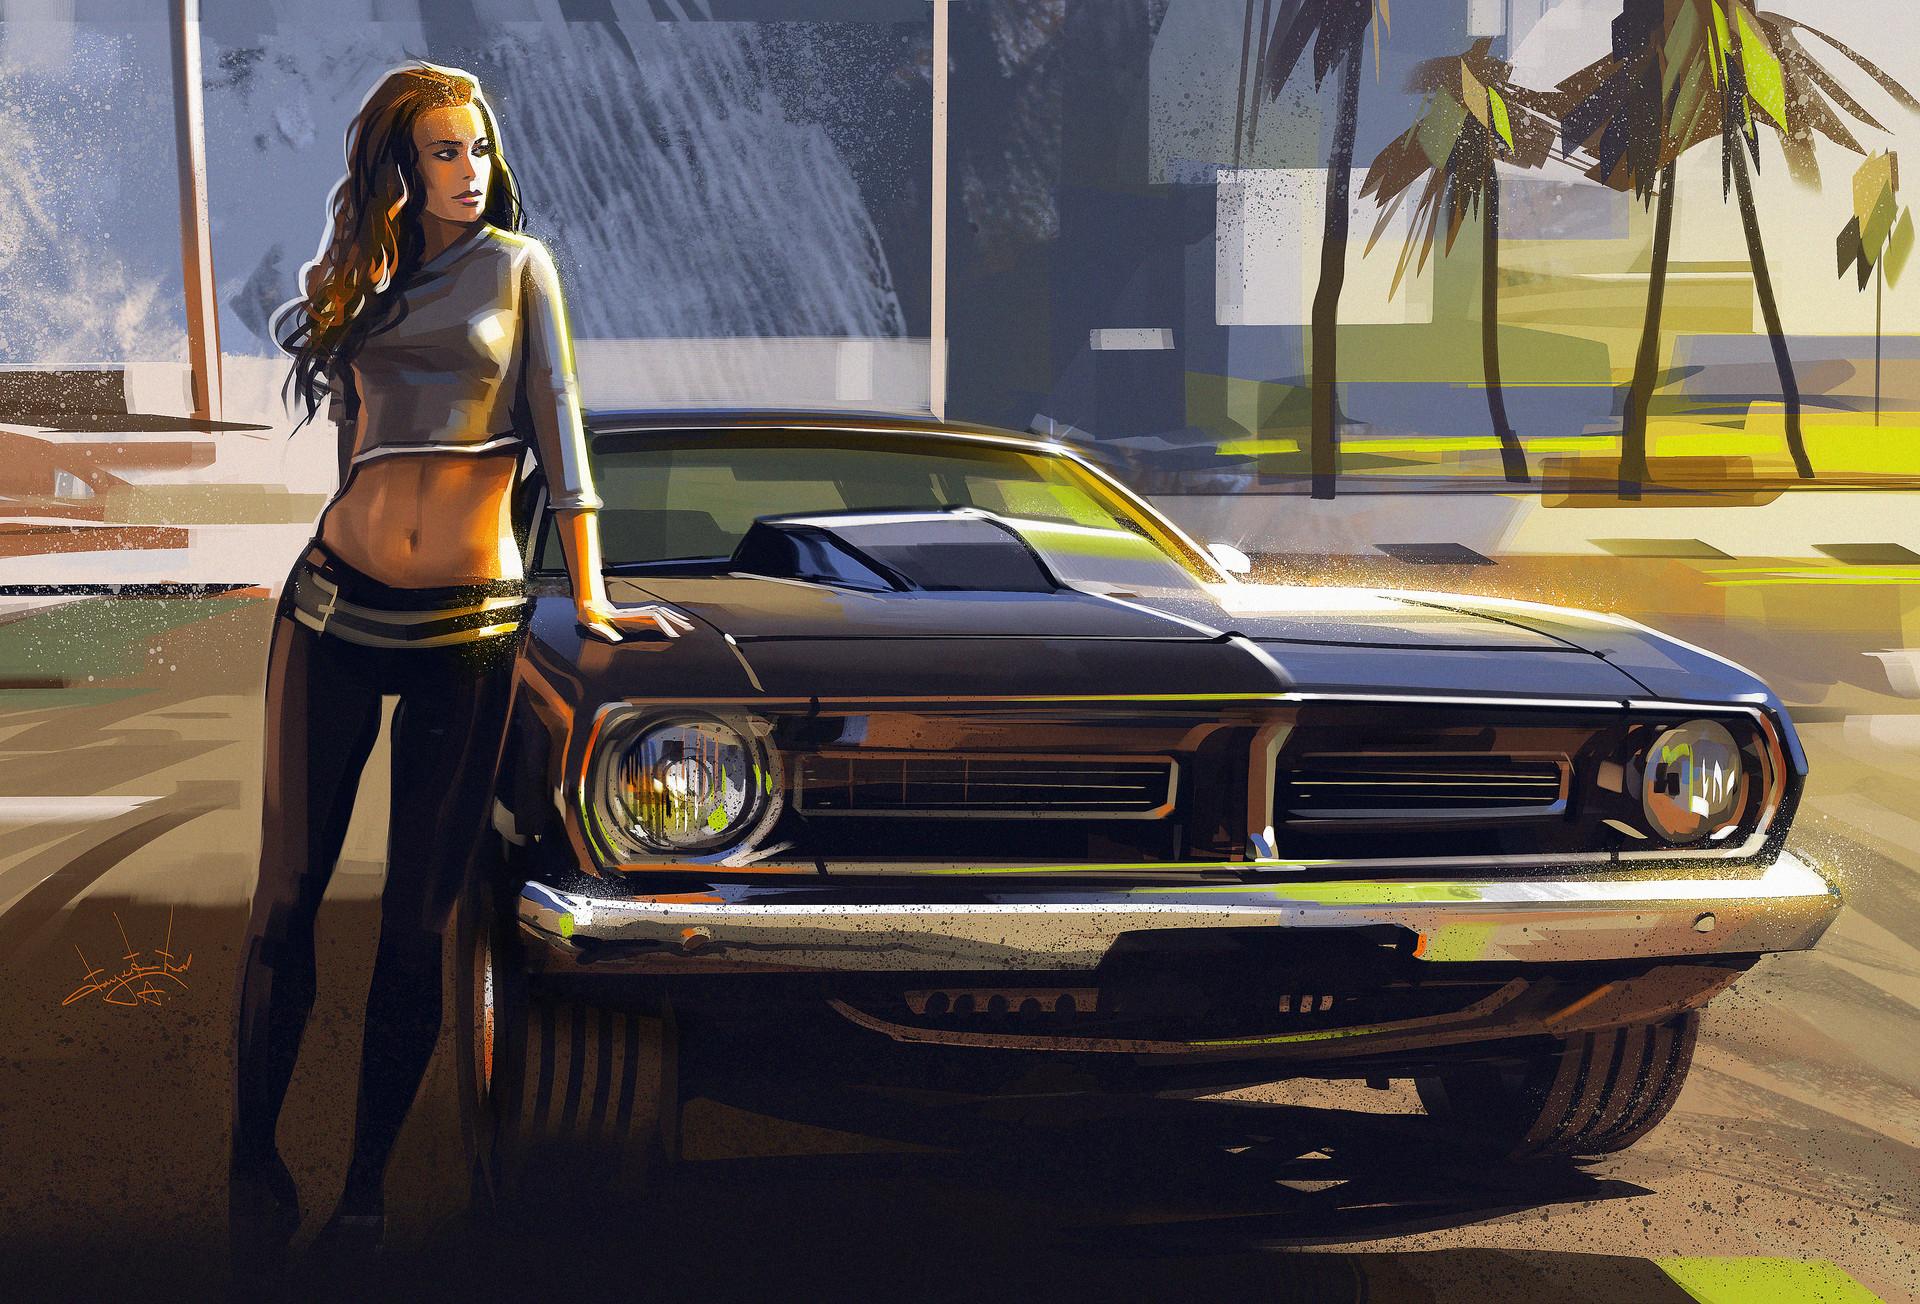 Girls & Cars HD Wallpaper | Background Image | 1920x1304 ...